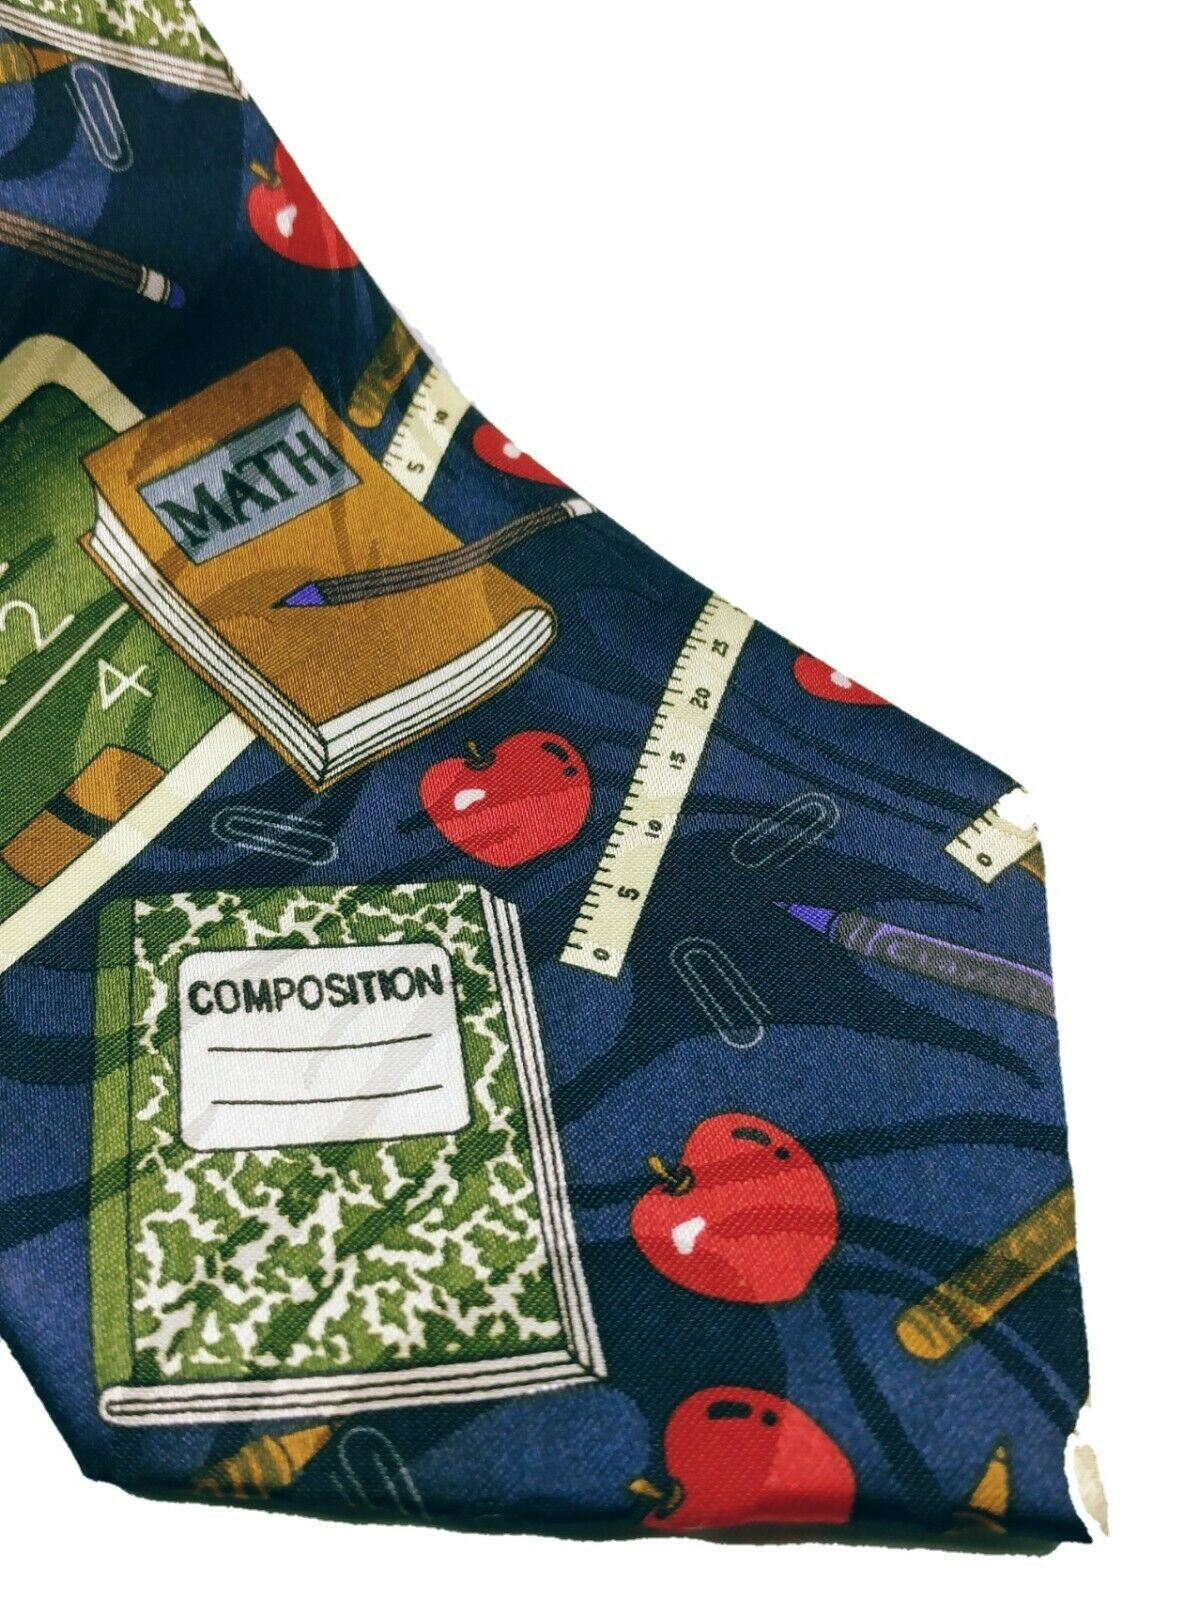 Fratello Men's School Days Teacher Math Ruler Composition Necktie Novelty image 4